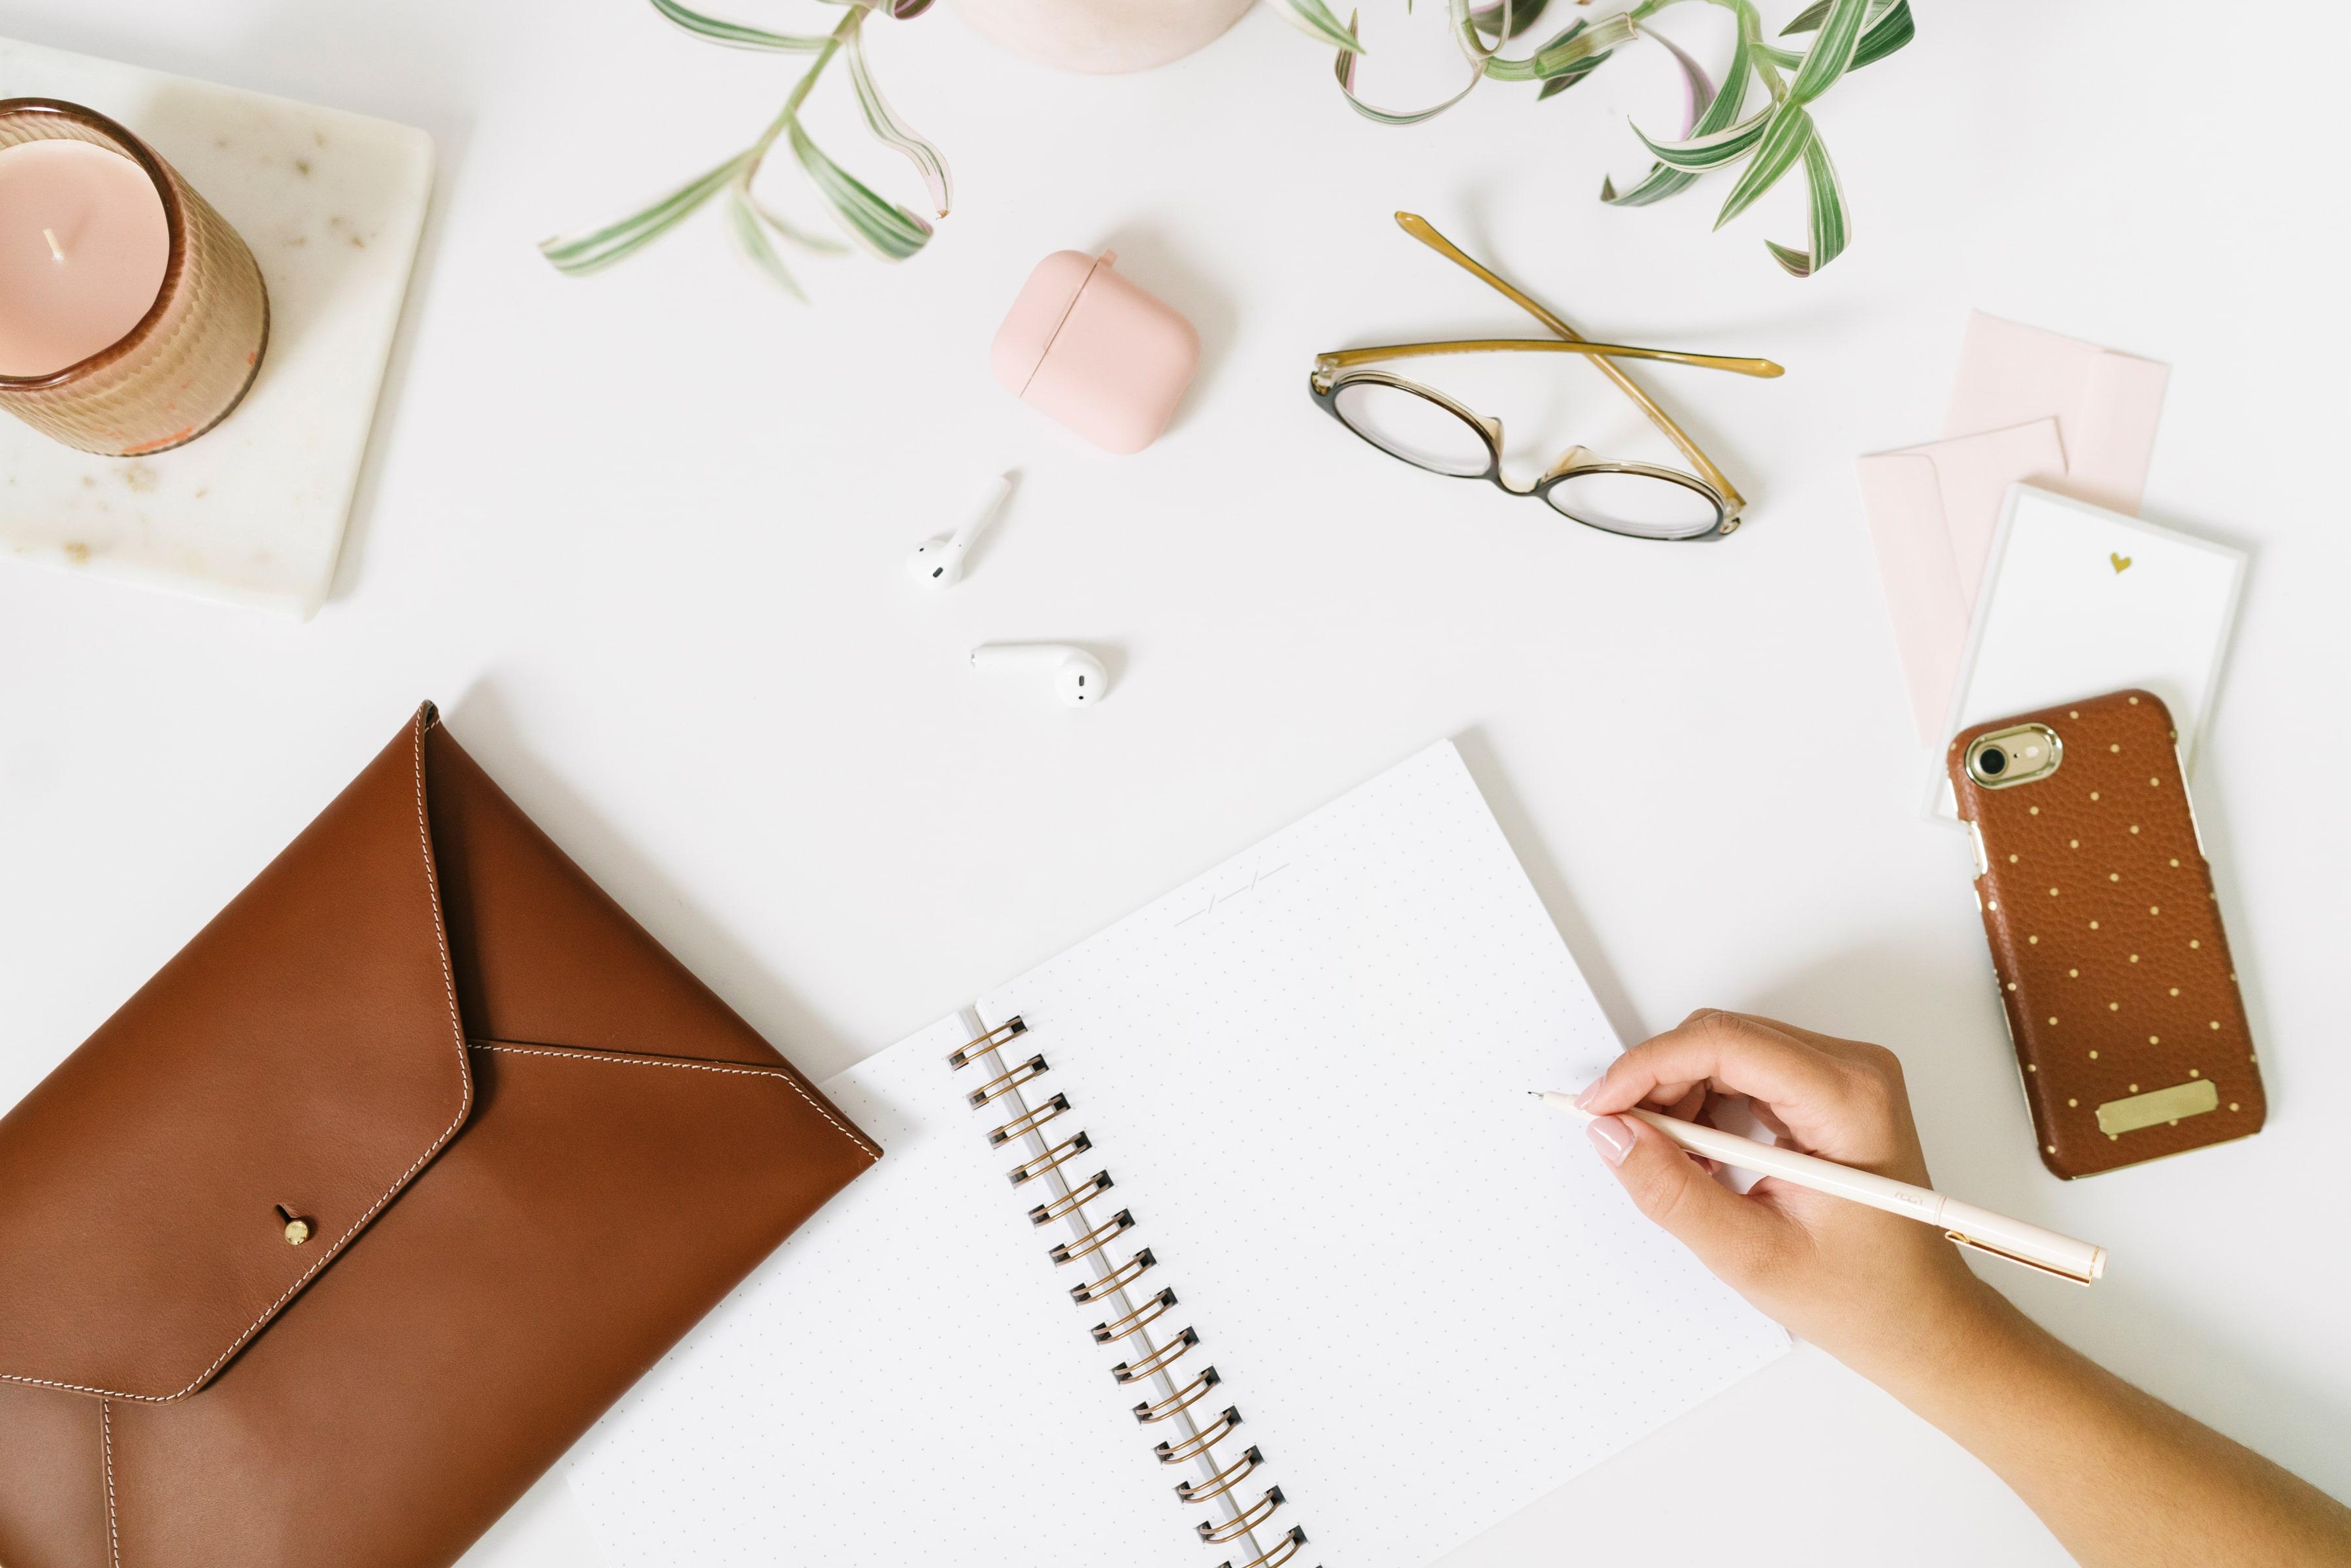 Practicing Gratitude to Achieve your Goals